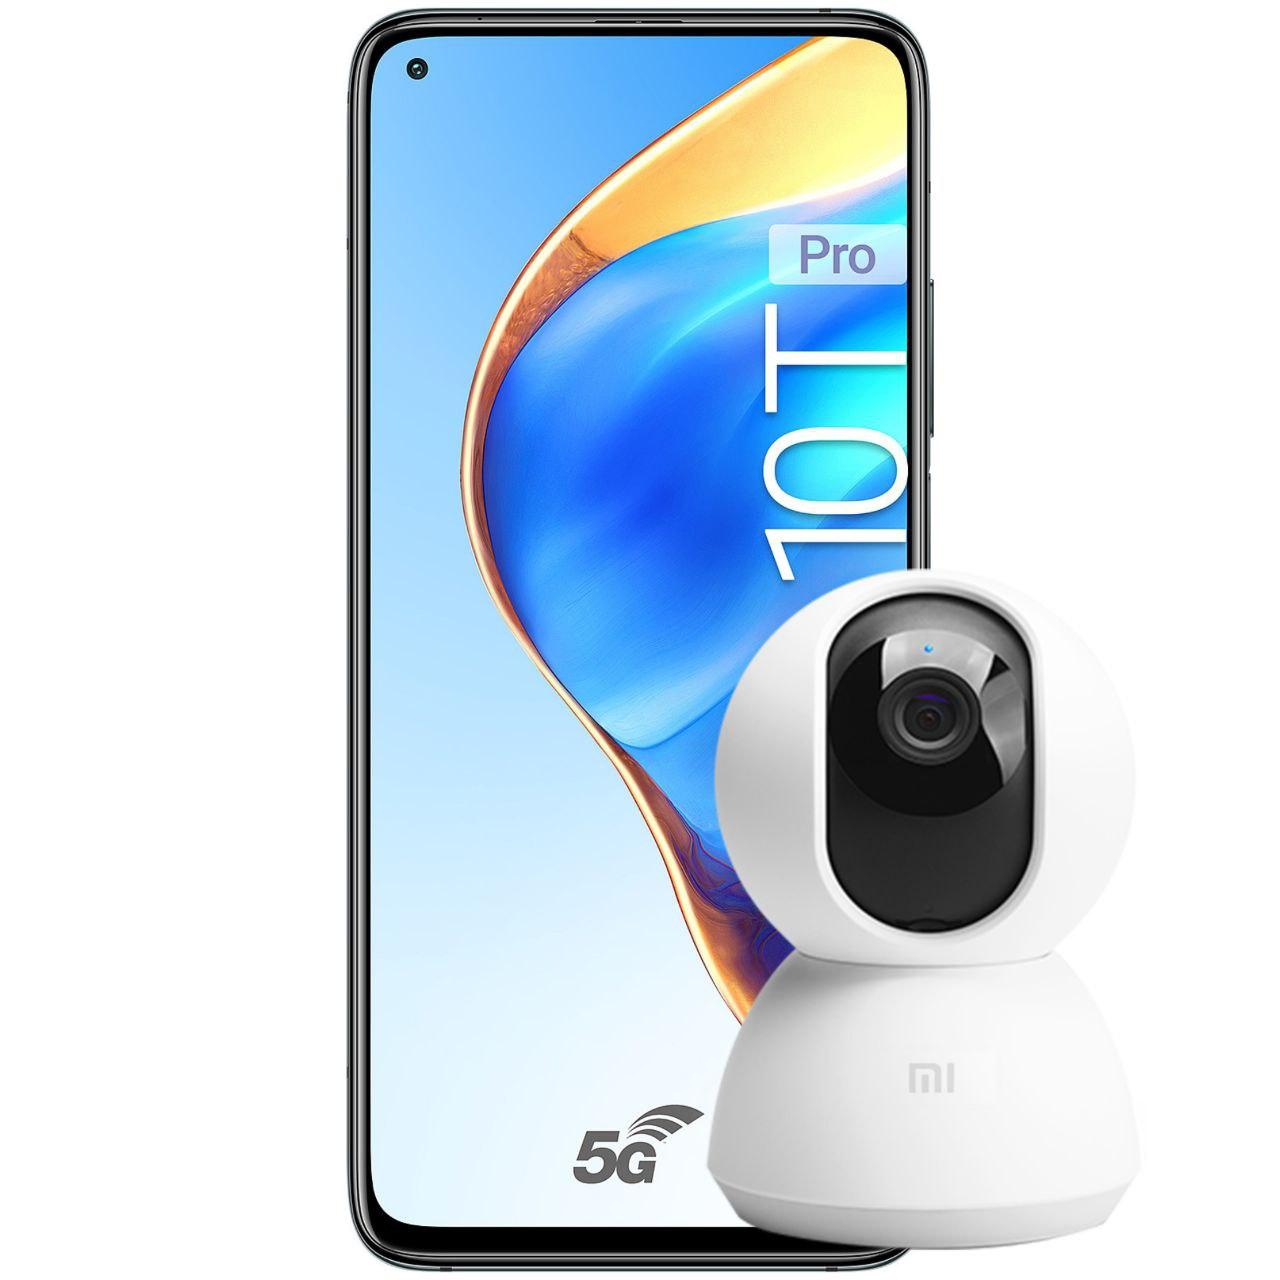 Xiaomi Mi 10T Pro 256GB / 8GB (Black, 5000mAh, Snapdragon 865) + Mi Home Security Camera 1080p - £359 using check-in coupon @ Xiaomi UK